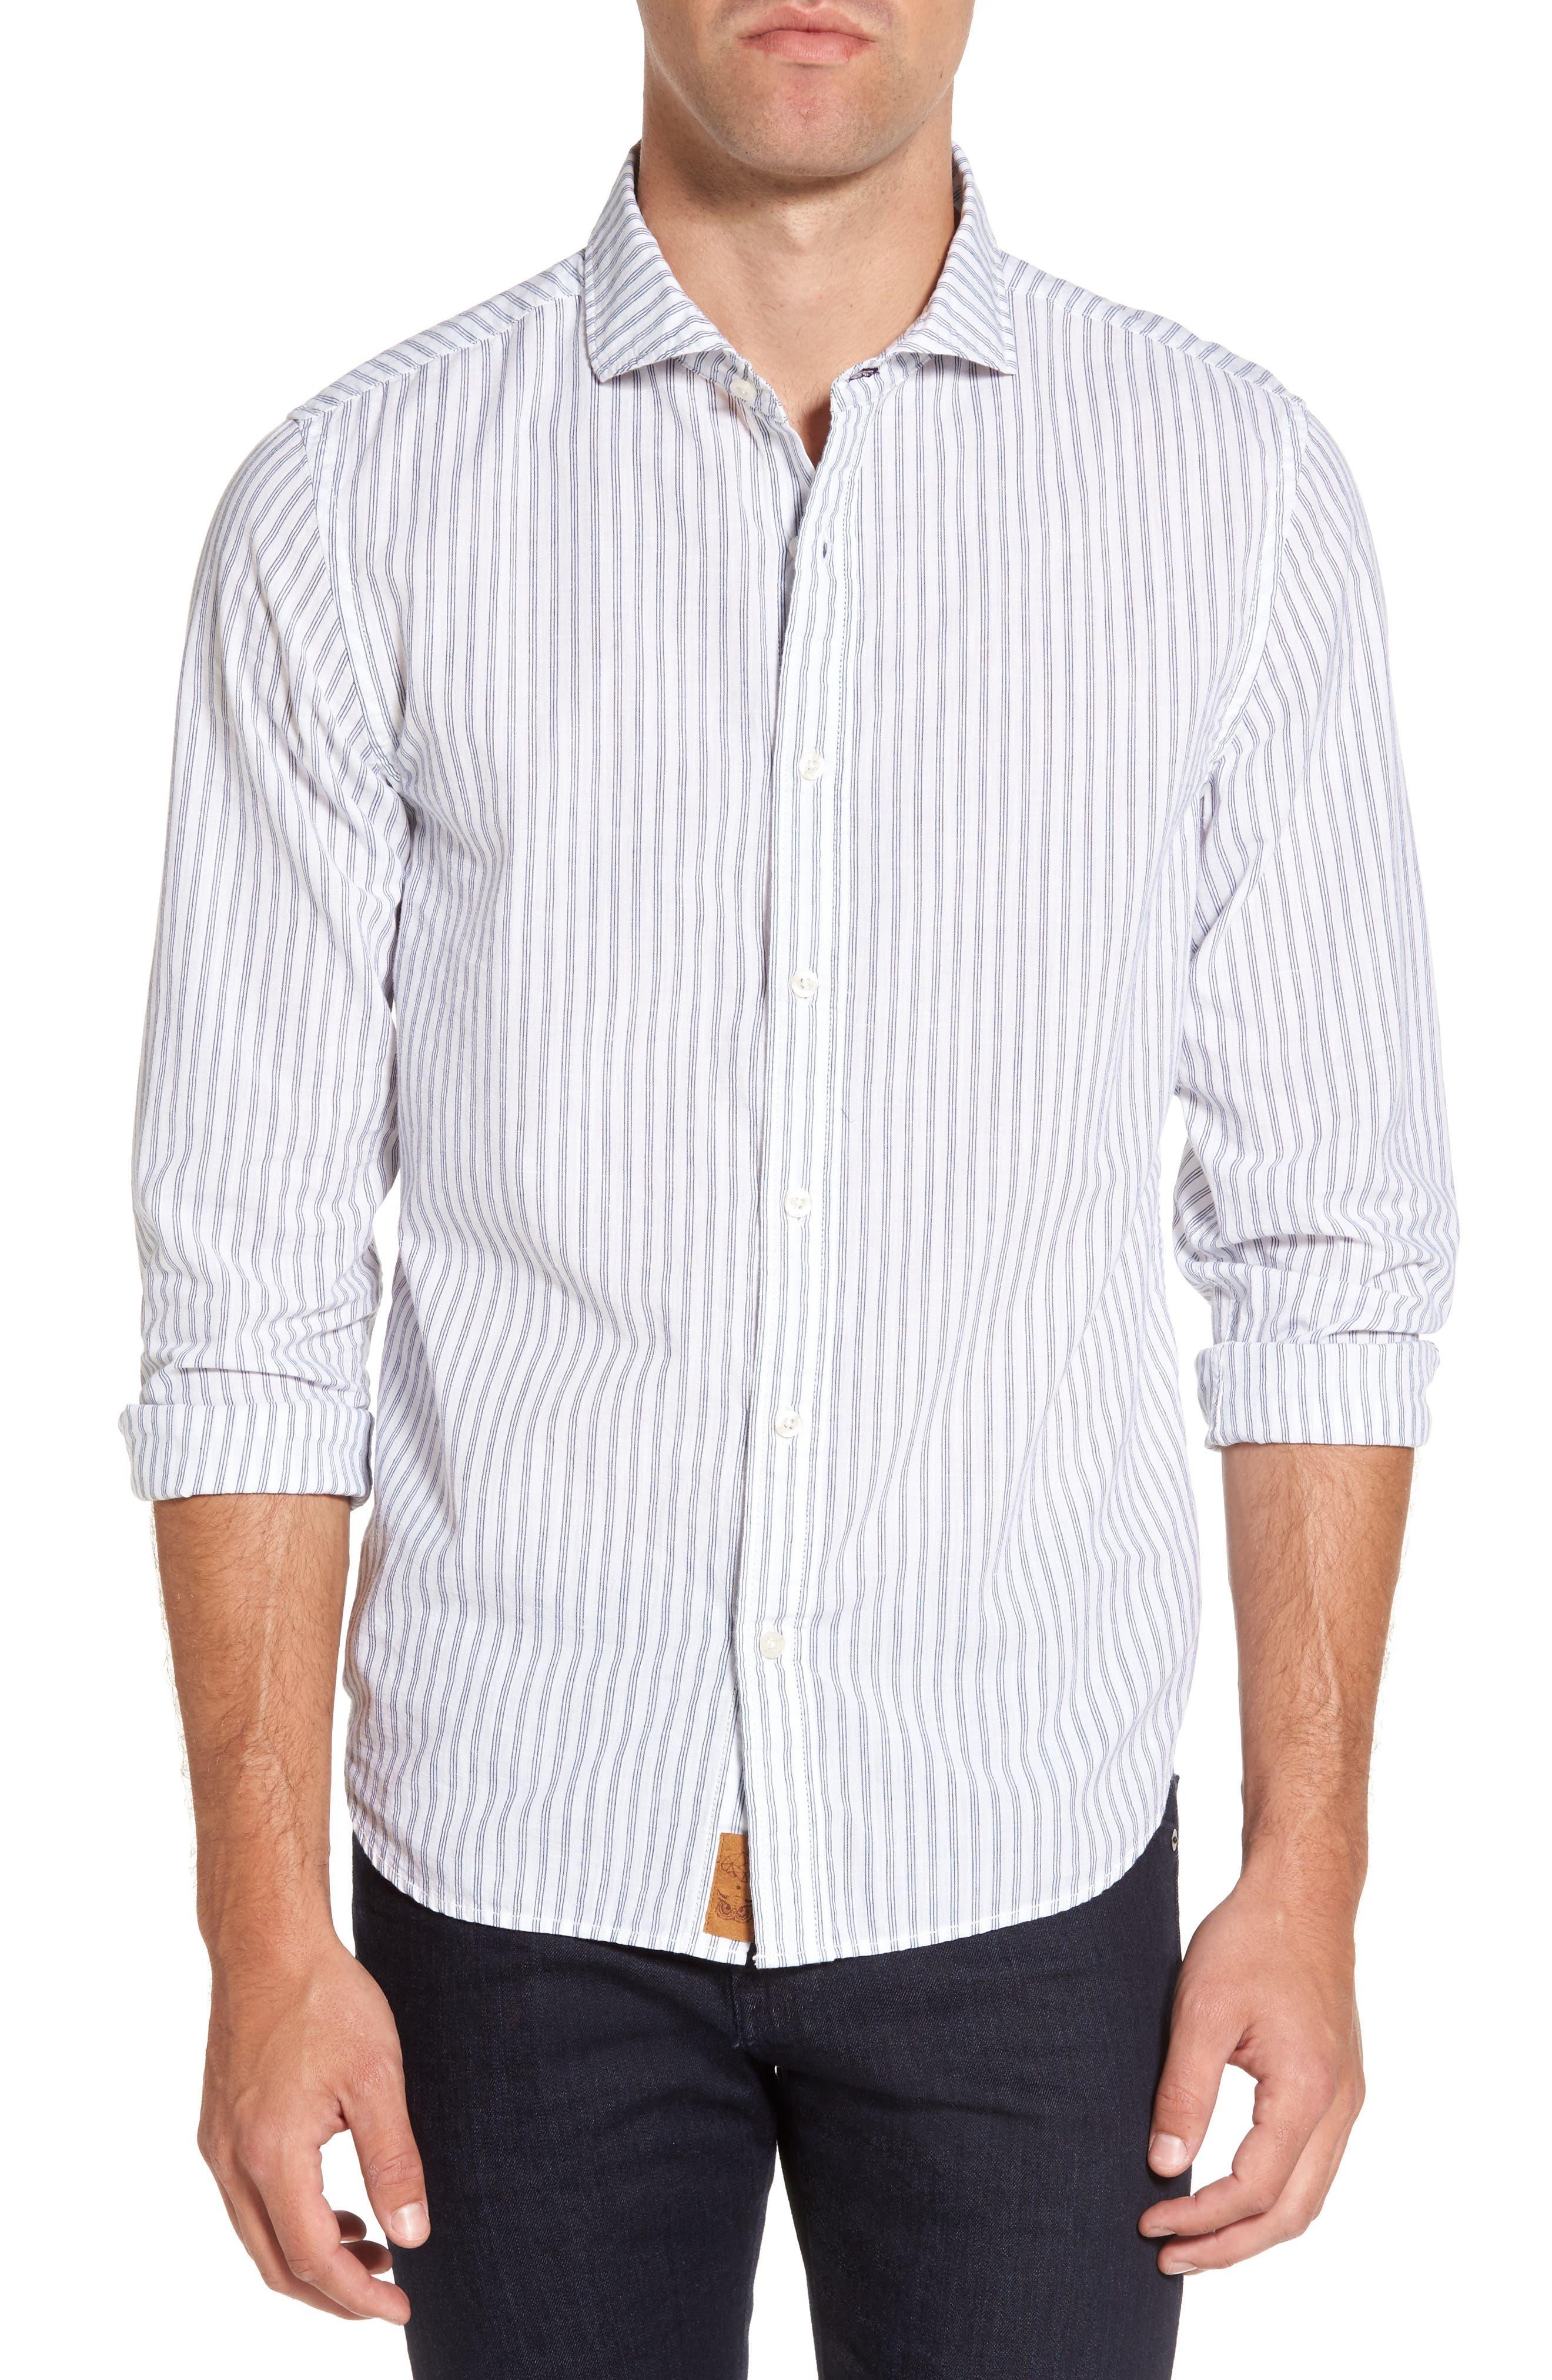 Main Image - Nifty Genius Earnest Stripe Sport Shirt